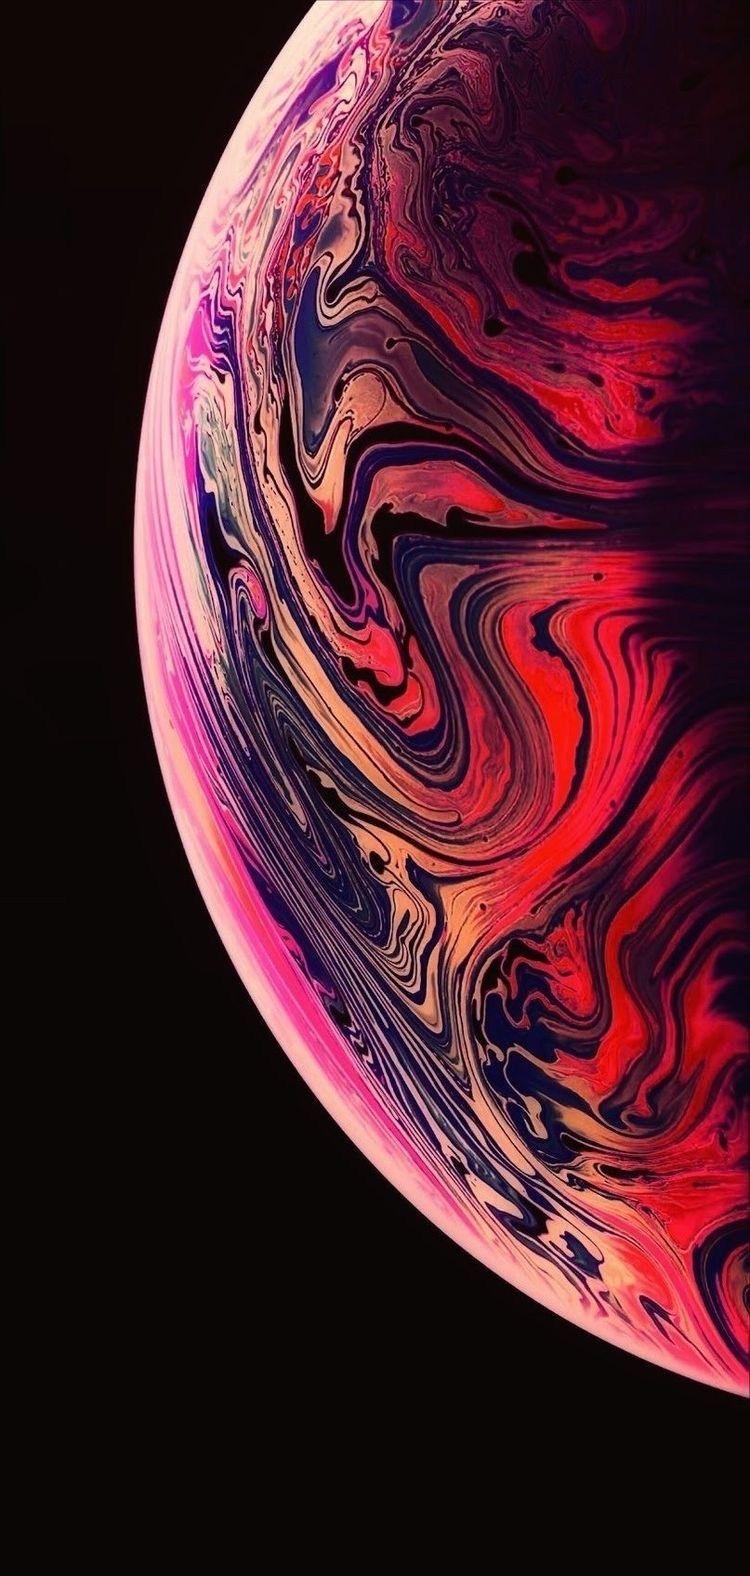 Wallpaper iPhone/Android Papel de parede apple, Papel